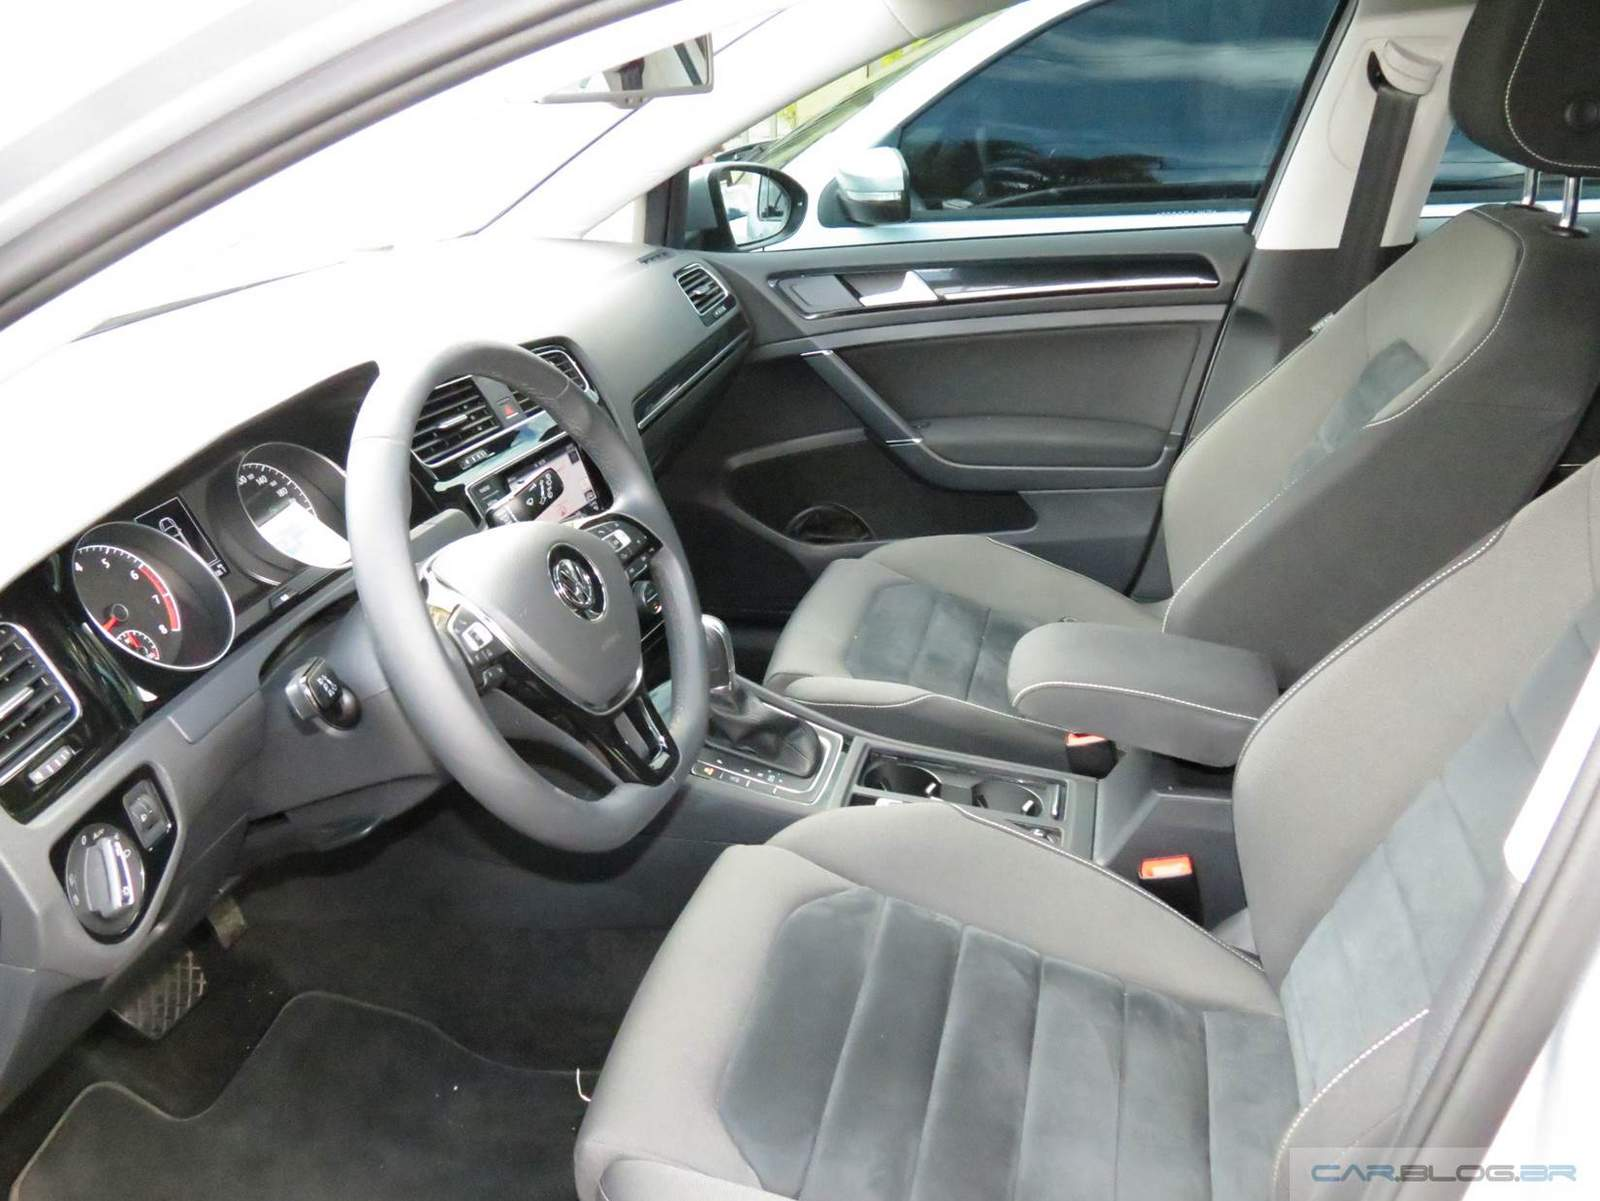 Golf TSI DSG Automático - interior - detalhes